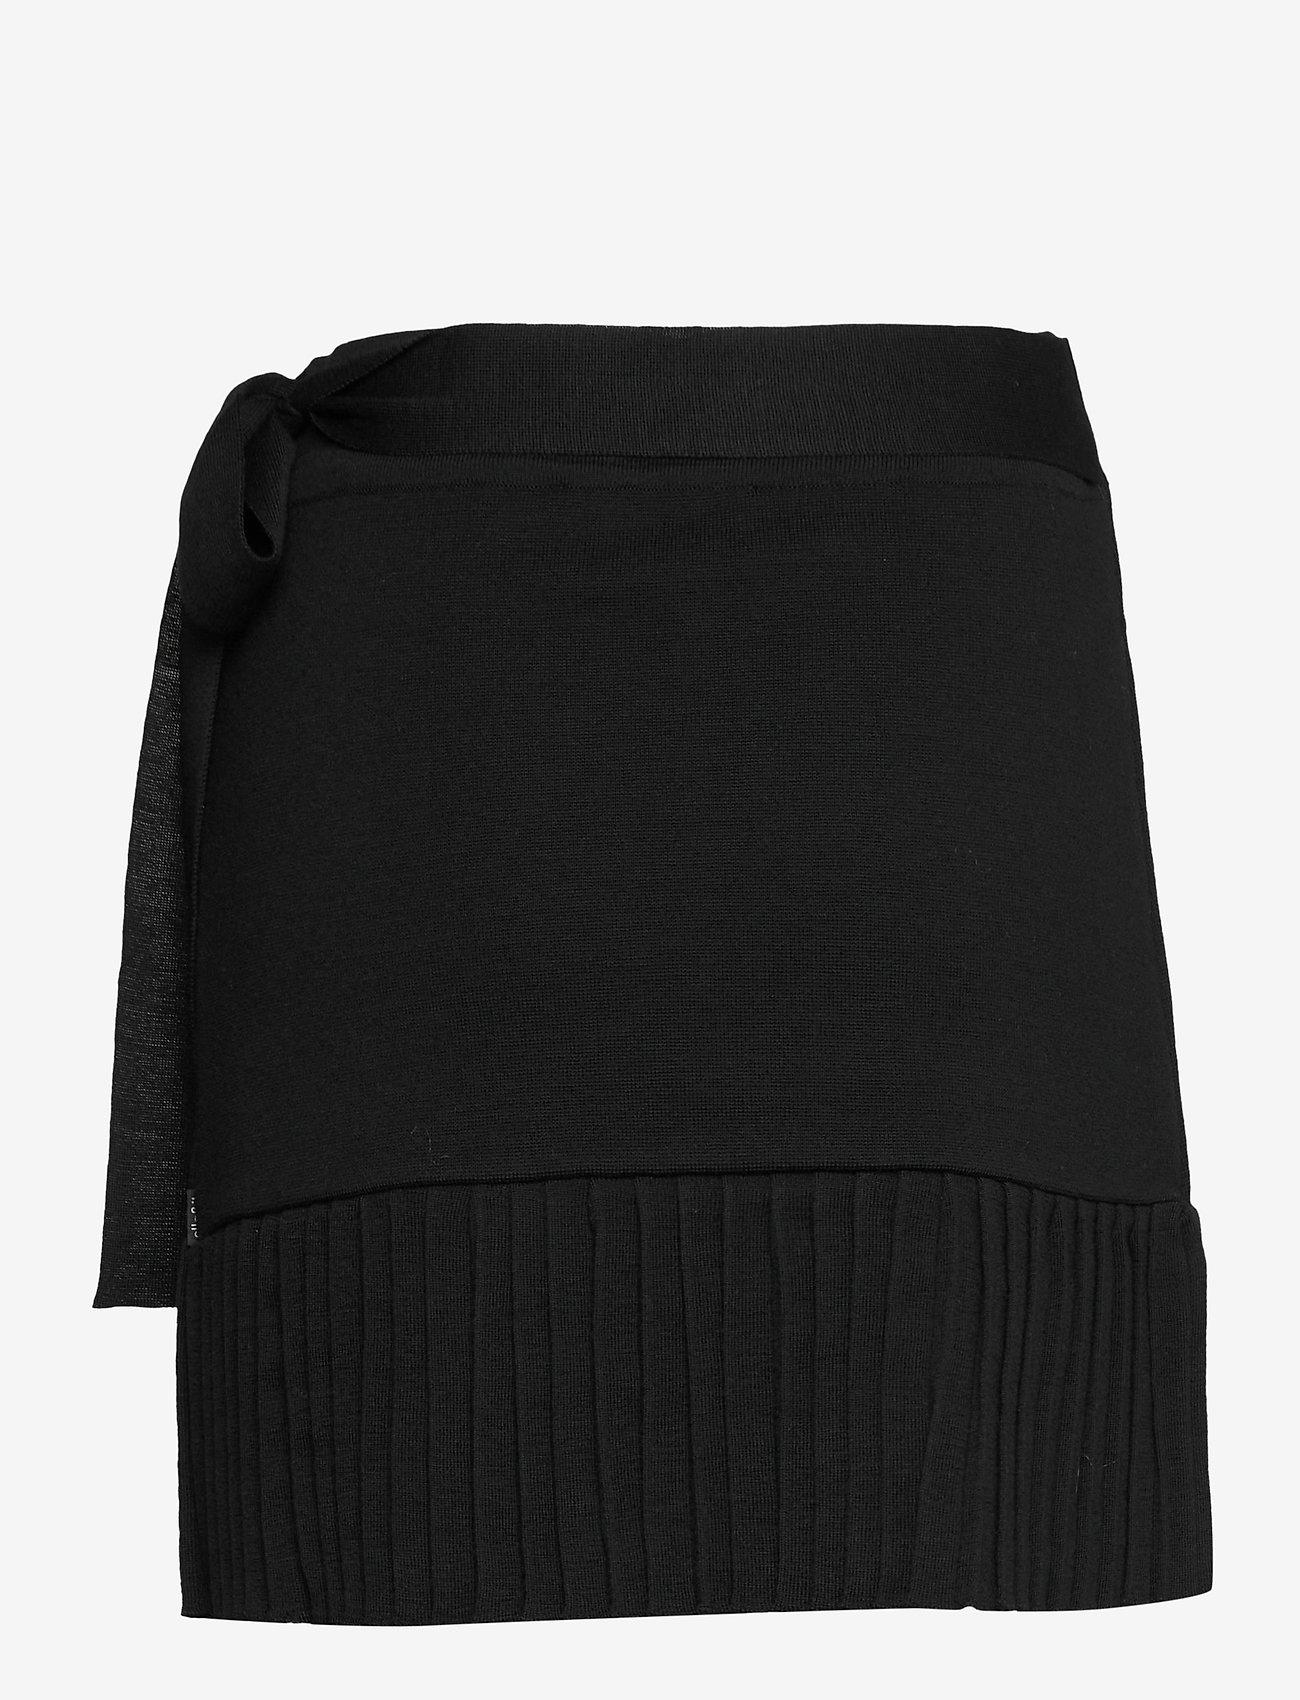 ella&il - Lucy merino skirt - jupes portefeuille - black - 1